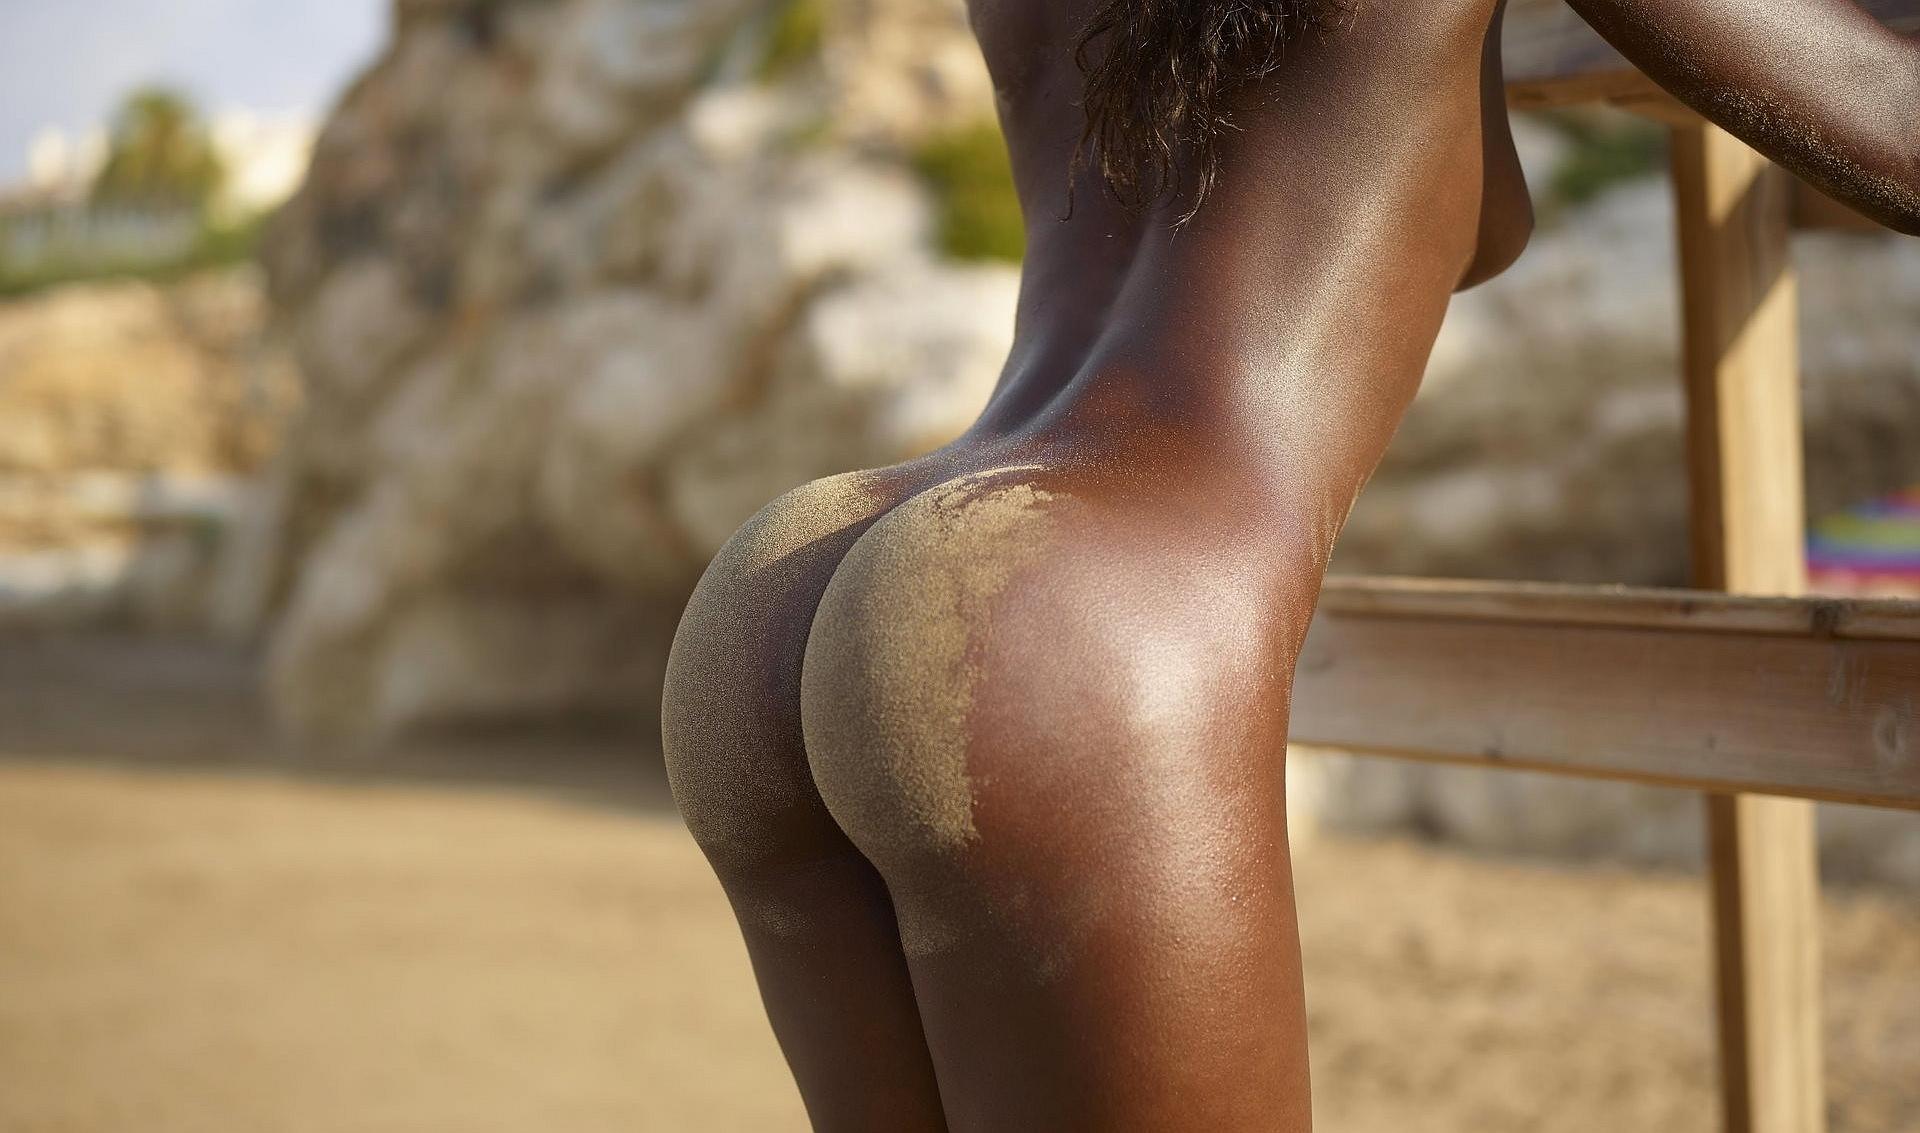 Ebony porn women ass pictures